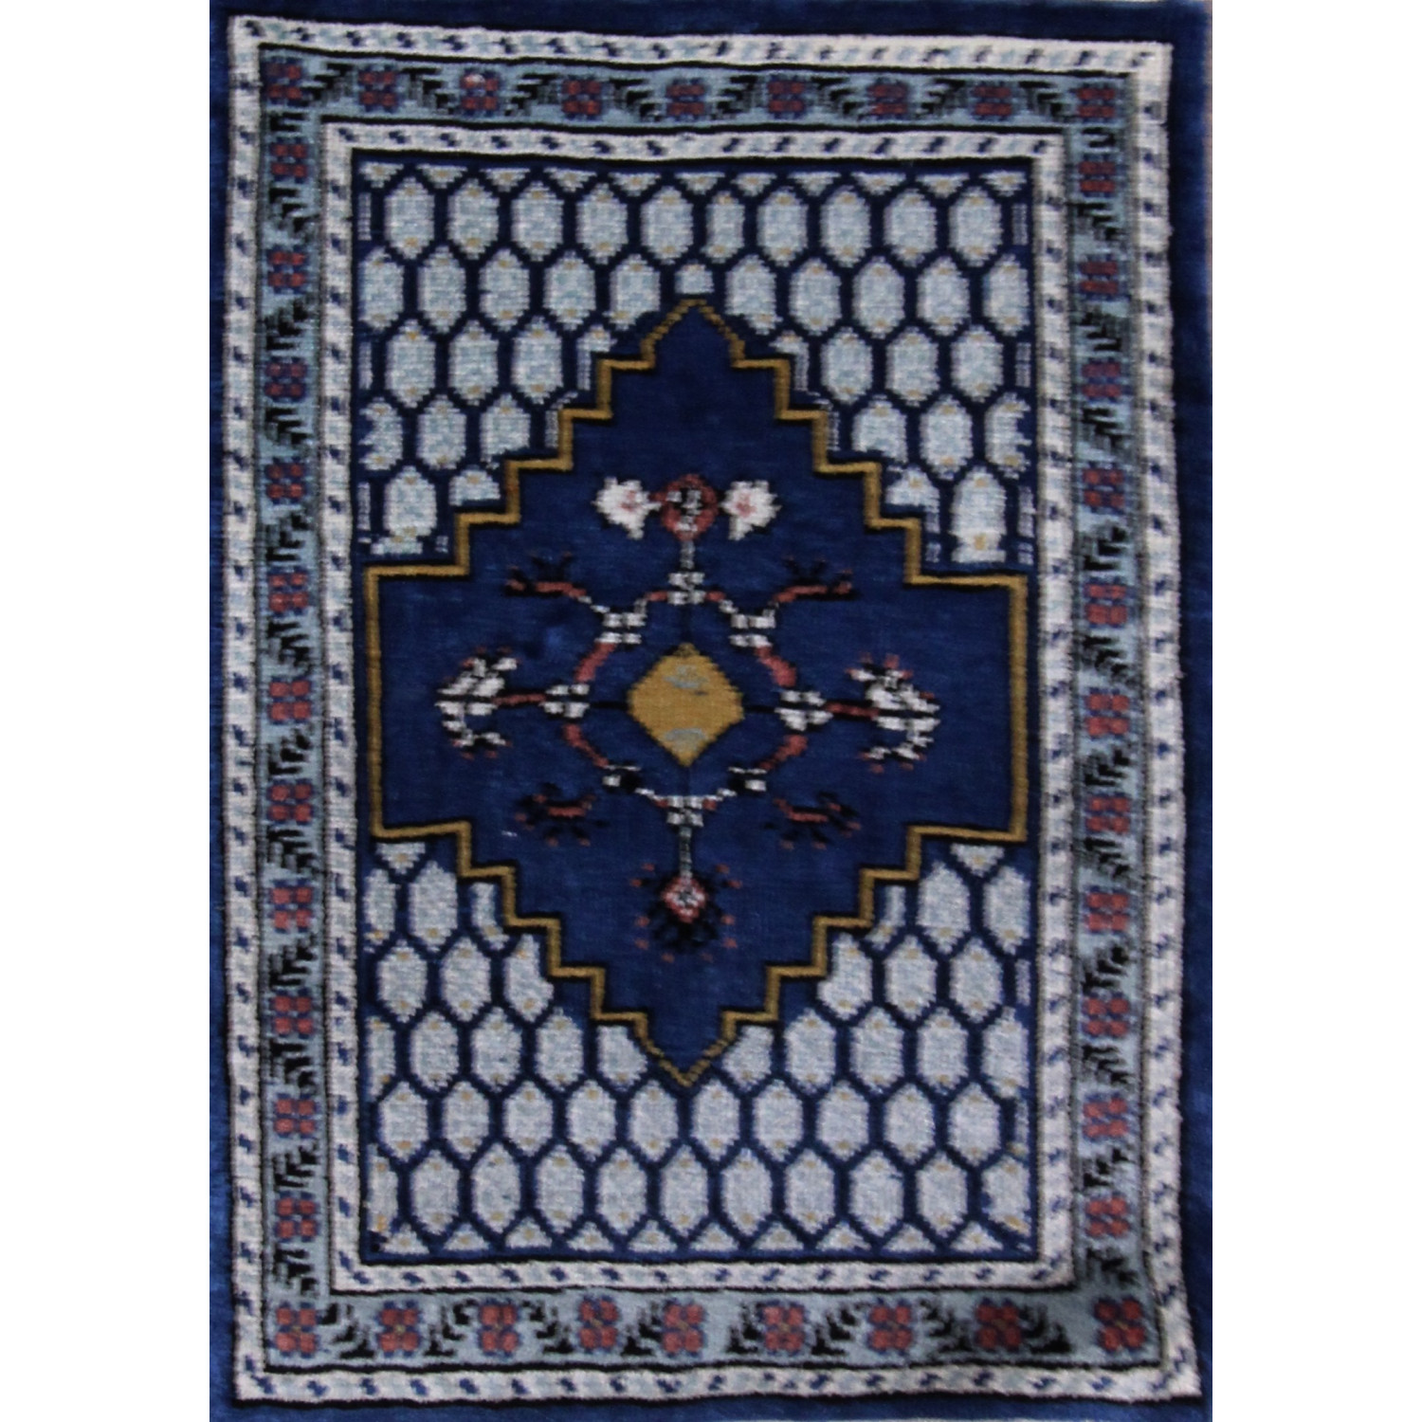 tapis artisanal motif bleu. Black Bedroom Furniture Sets. Home Design Ideas